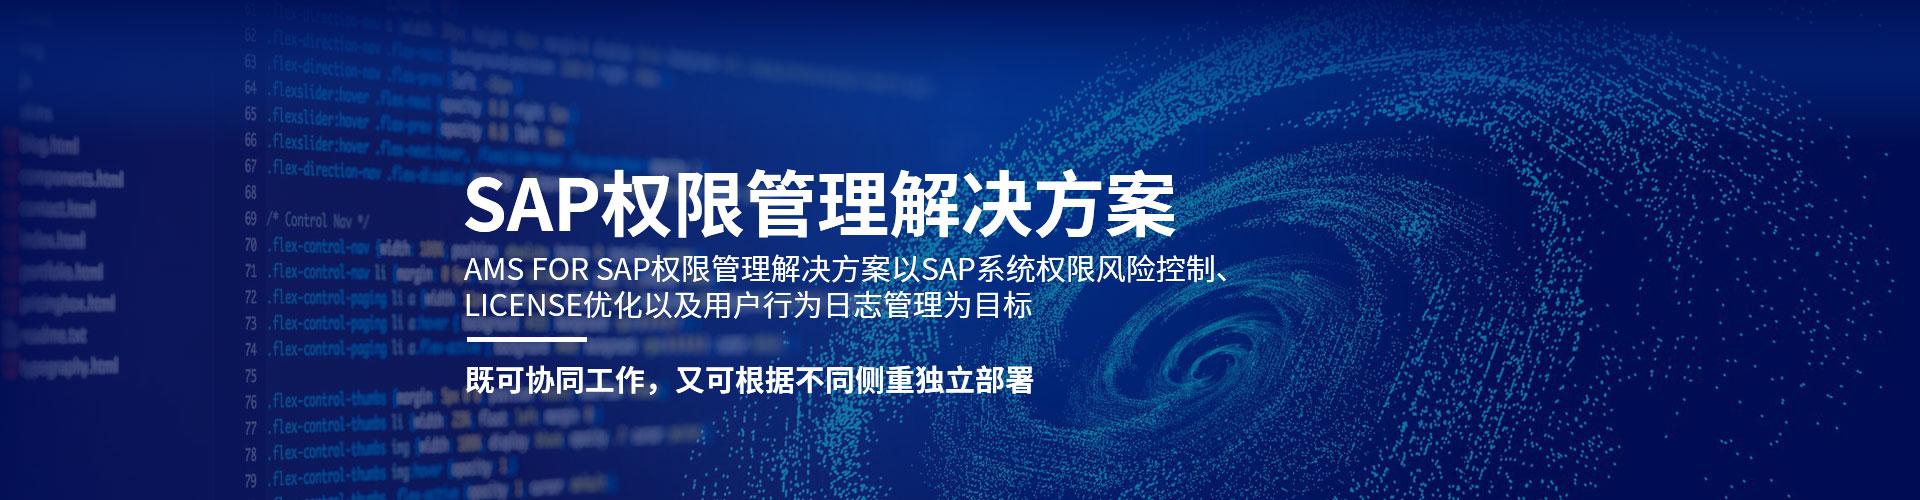 SAP权限审计解决方案